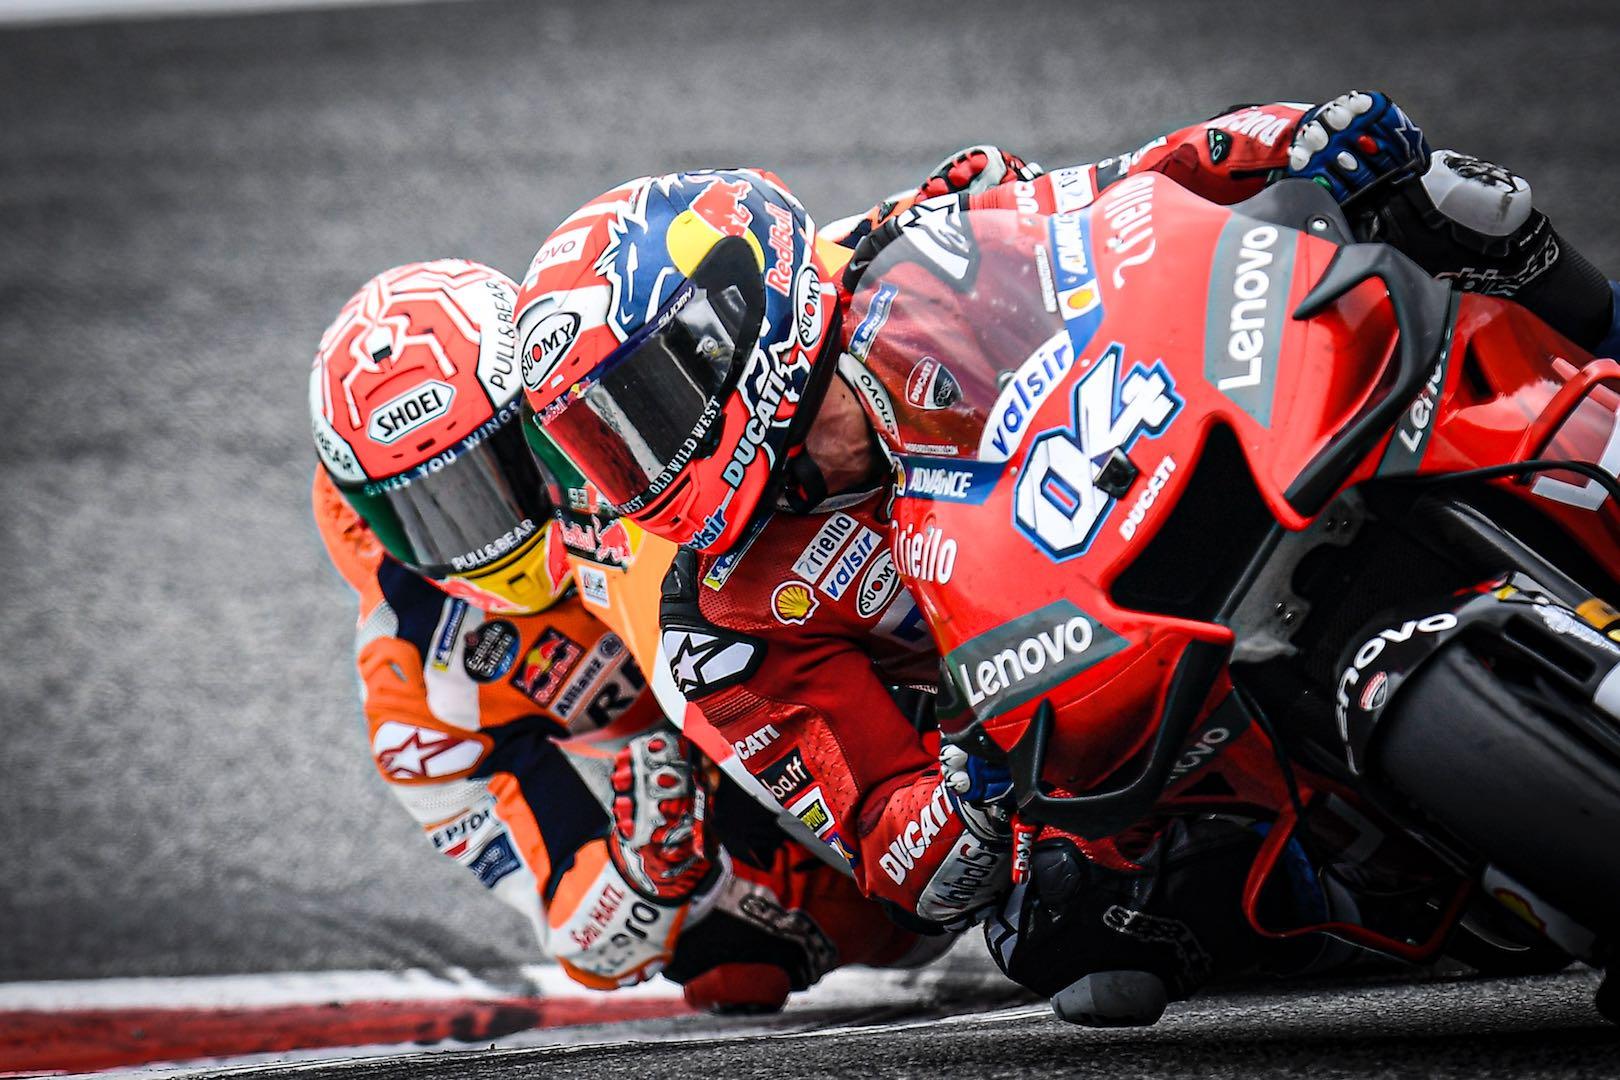 2019 Austria MotoGP Results